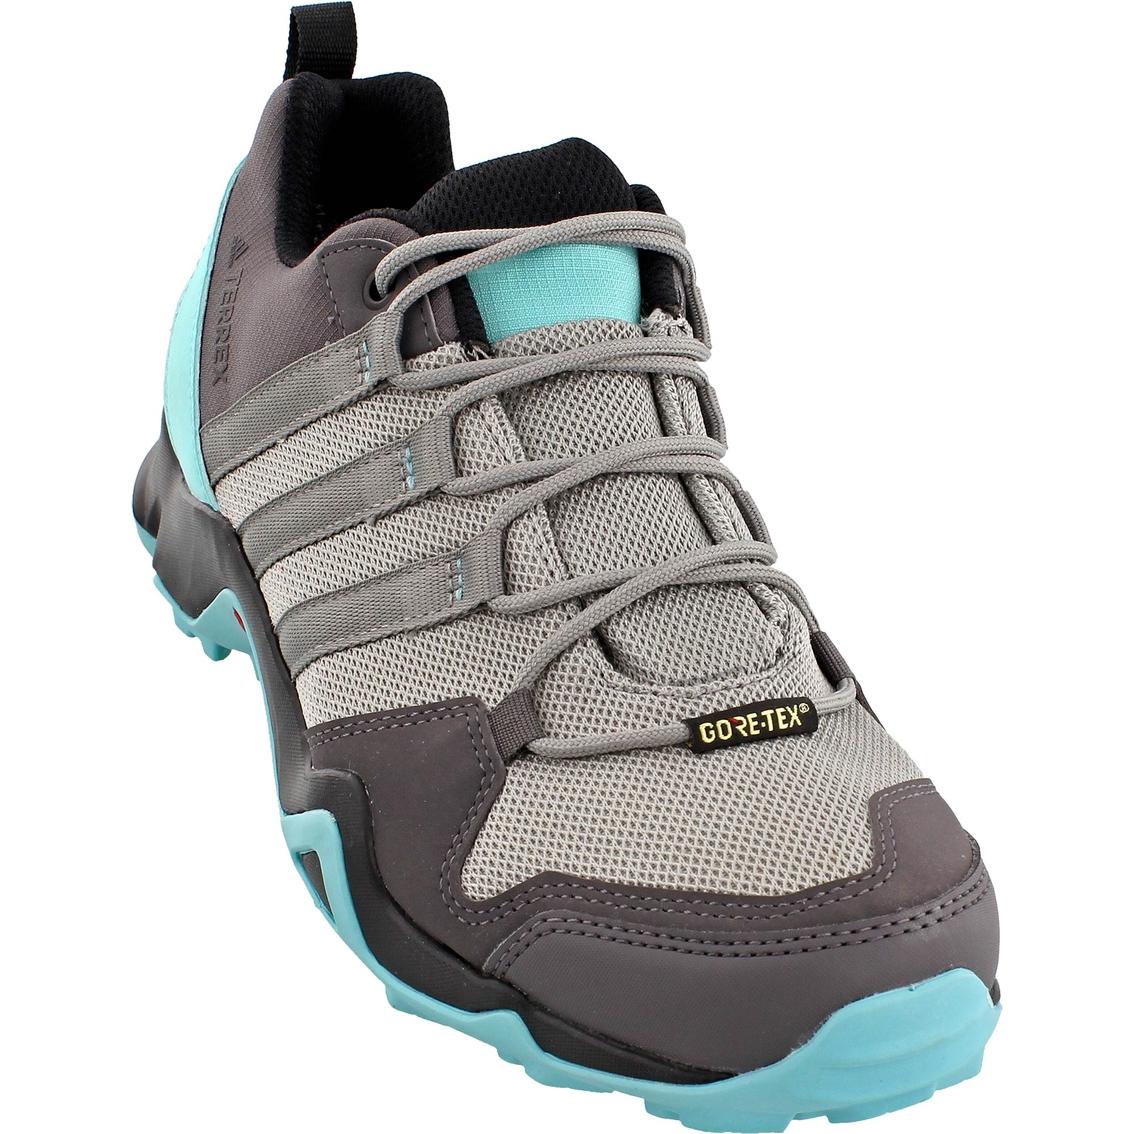 Adidas Outdoor Women's Terrex Ax2r Gtx Hiking Shoes | Hiking ...